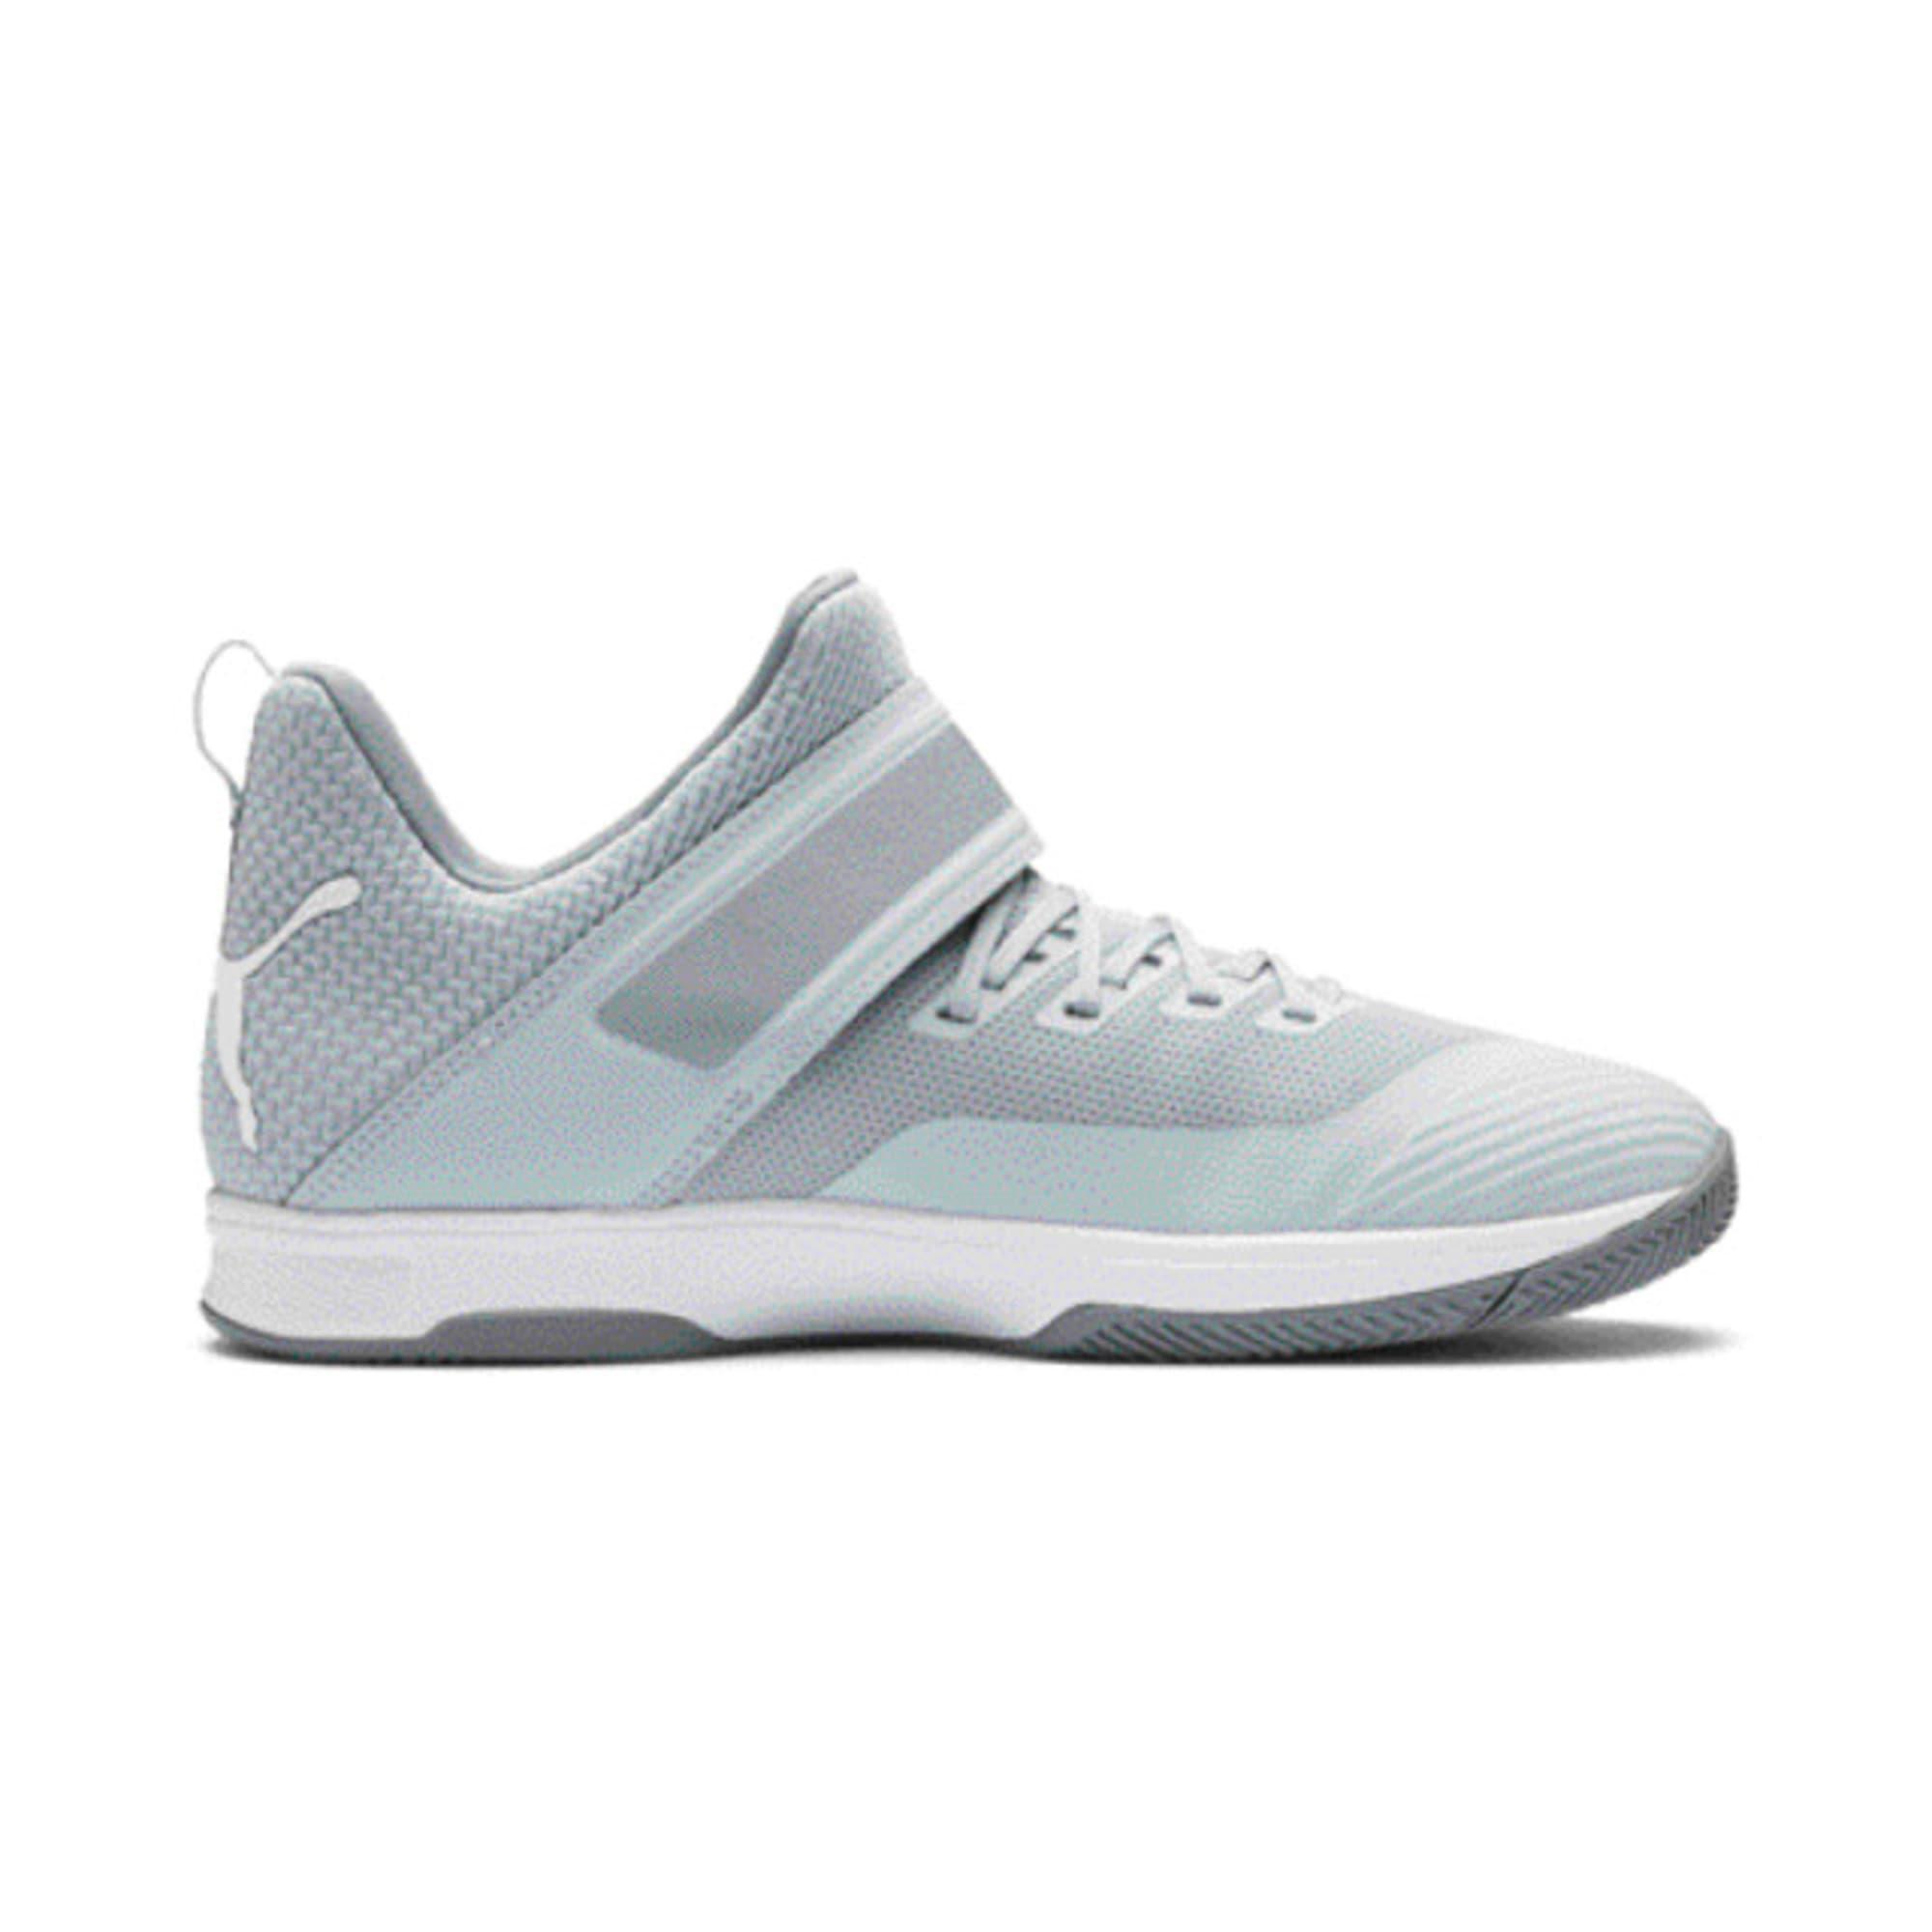 Thumbnail 5 of Rise XT3 Handball Shoes, Grey Dawn-White-Tradewinds, medium-IND